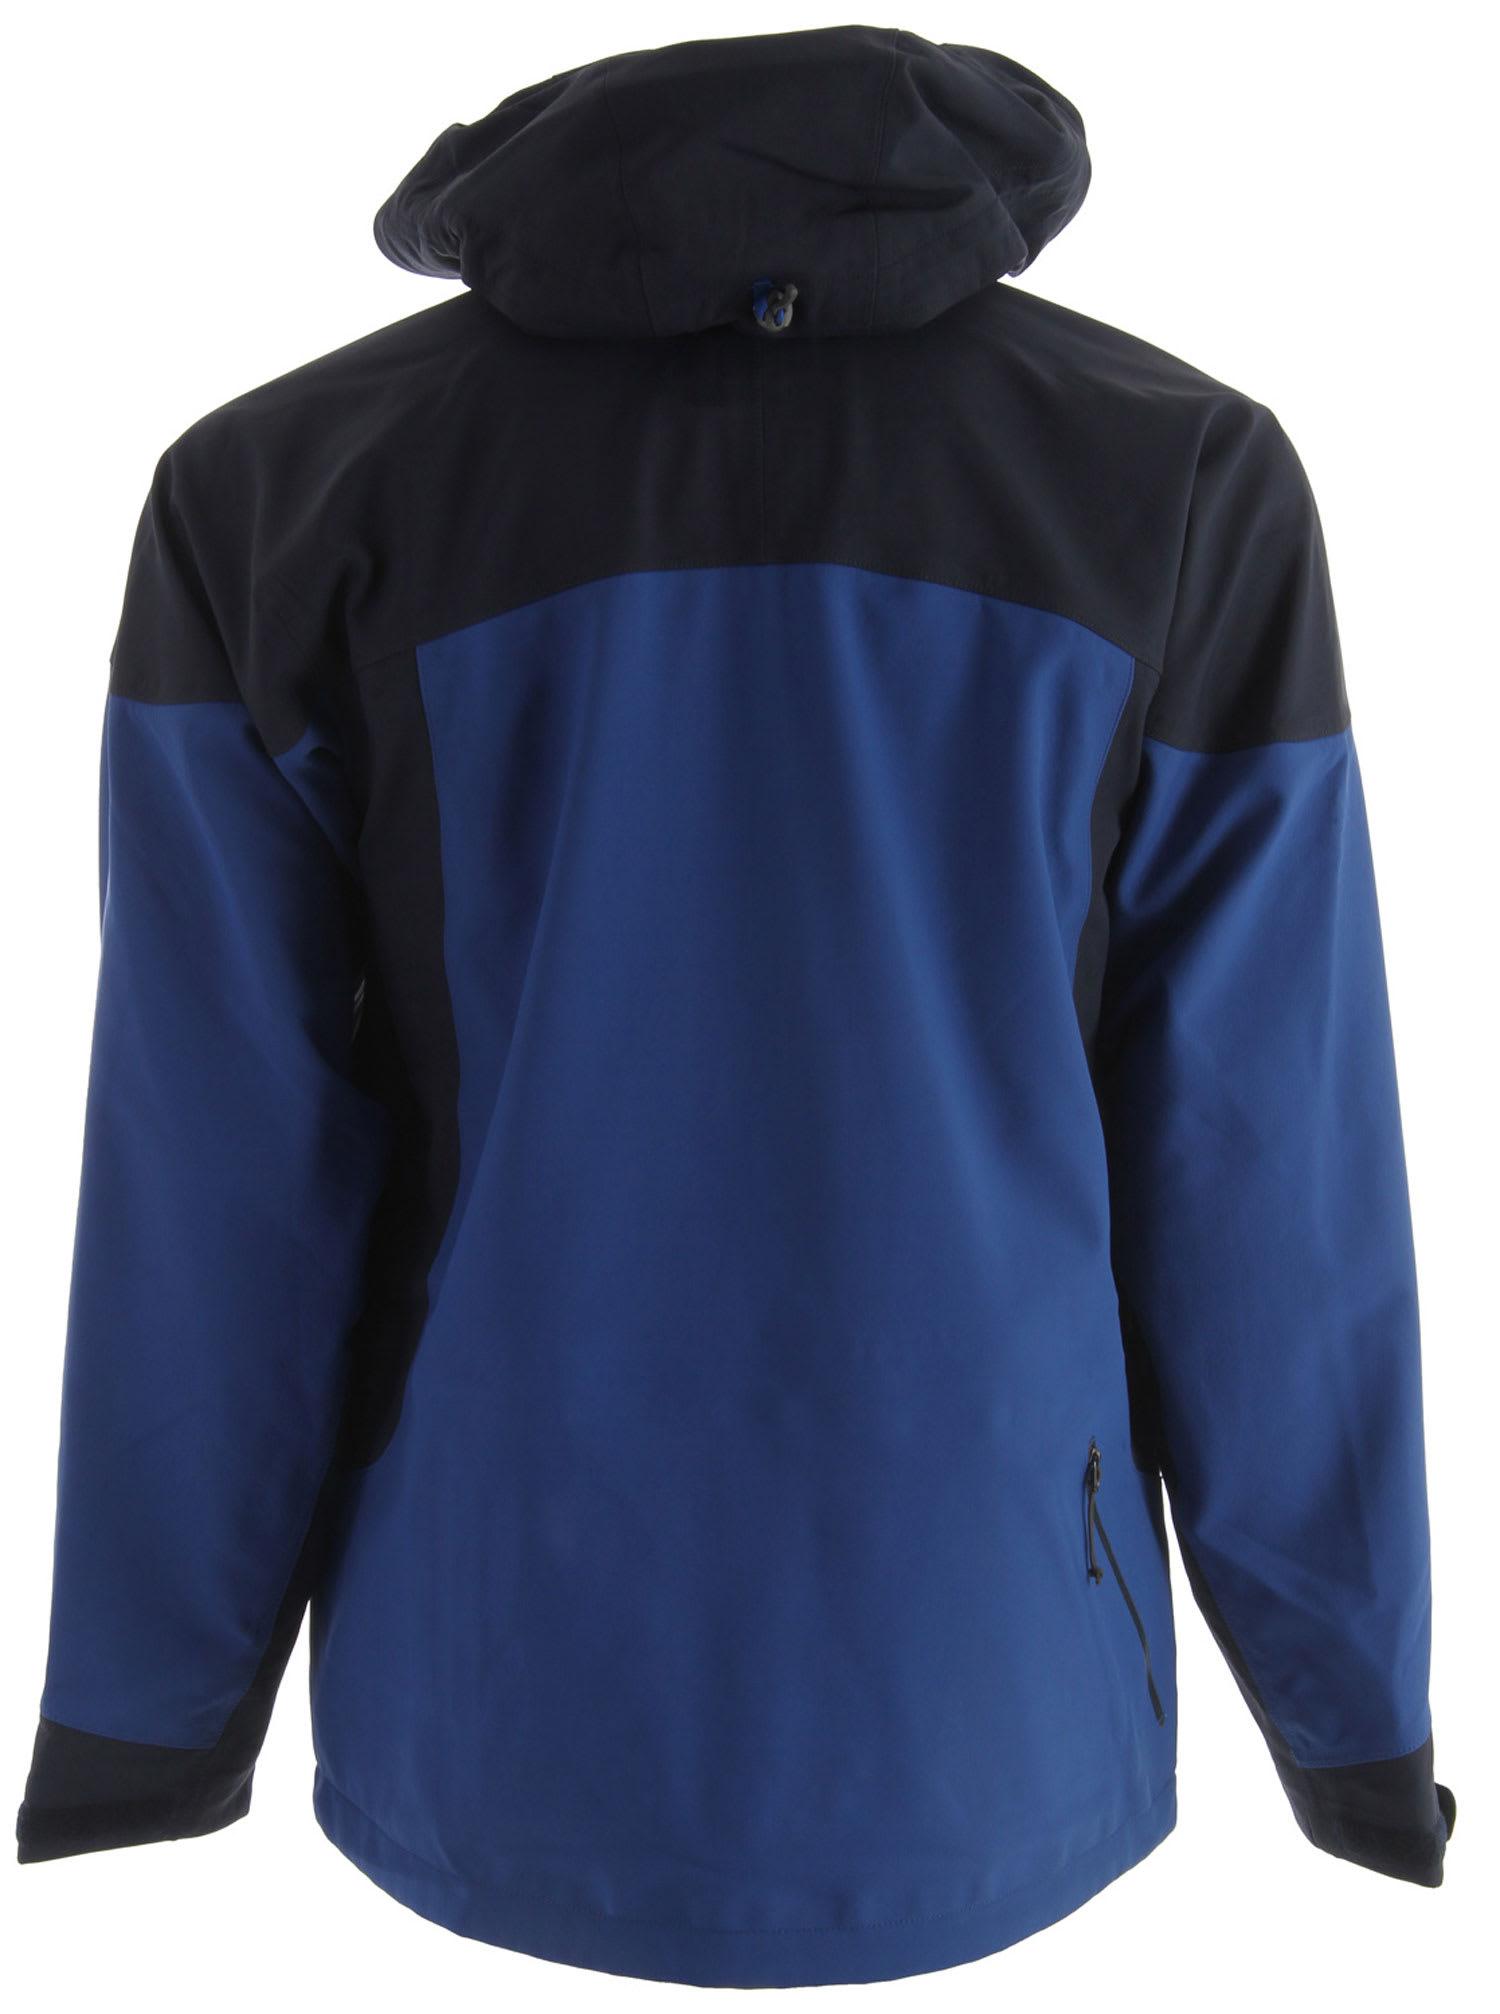 680f0b7cbd0 Outdoor Research Motto Ski Jacket - thumbnail 2